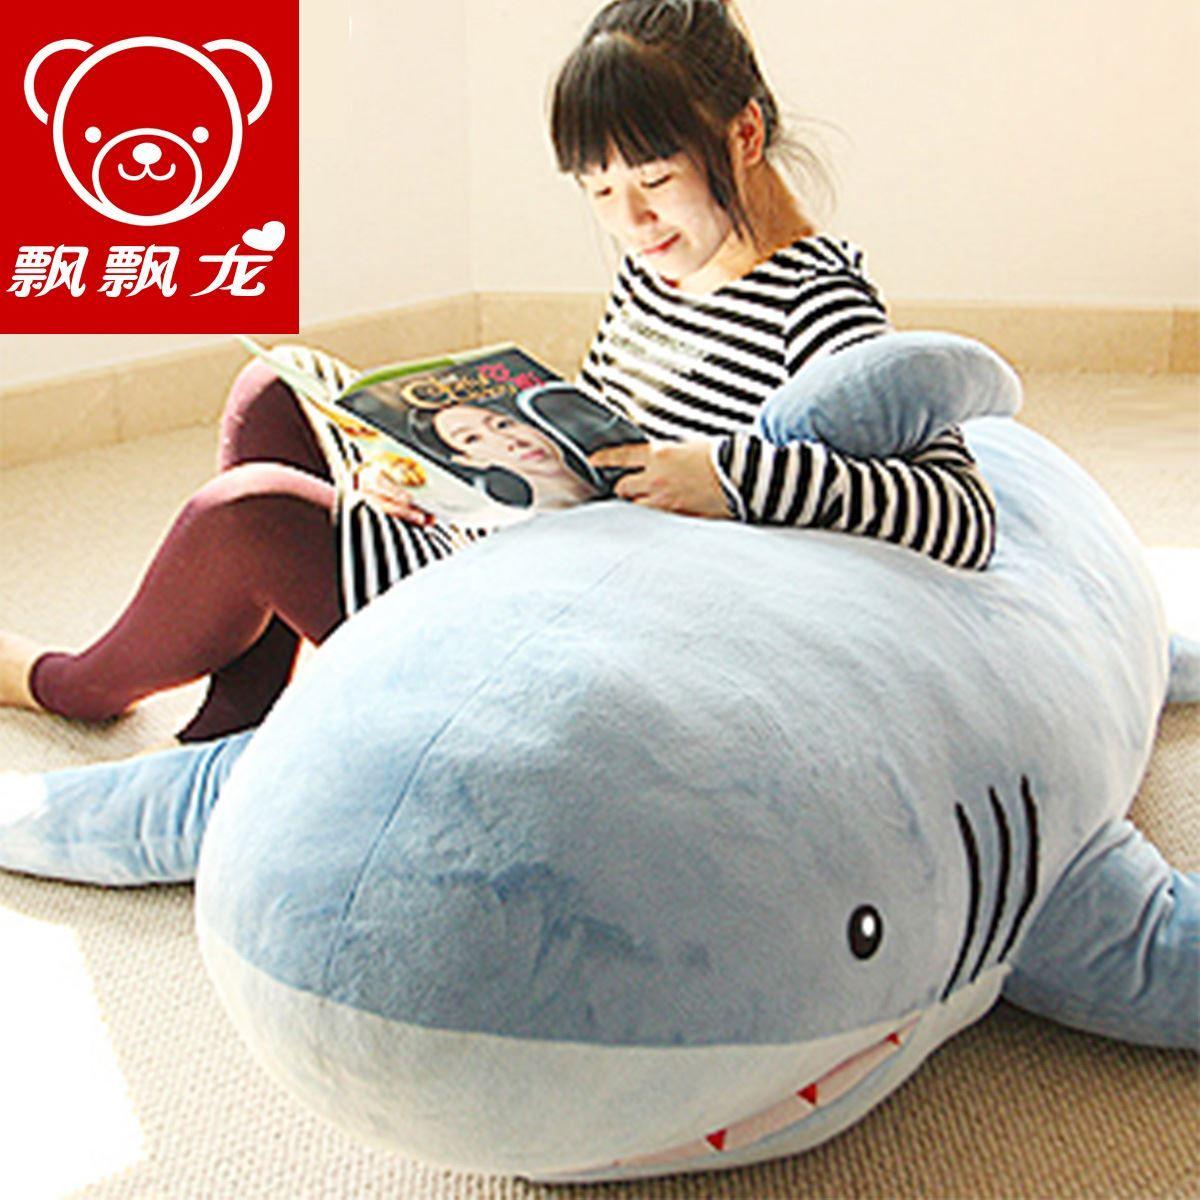 Shark Pillow Sleeping Bag 2017 fluttering dragon 1.8 m shark oversized plush toy doll pillow